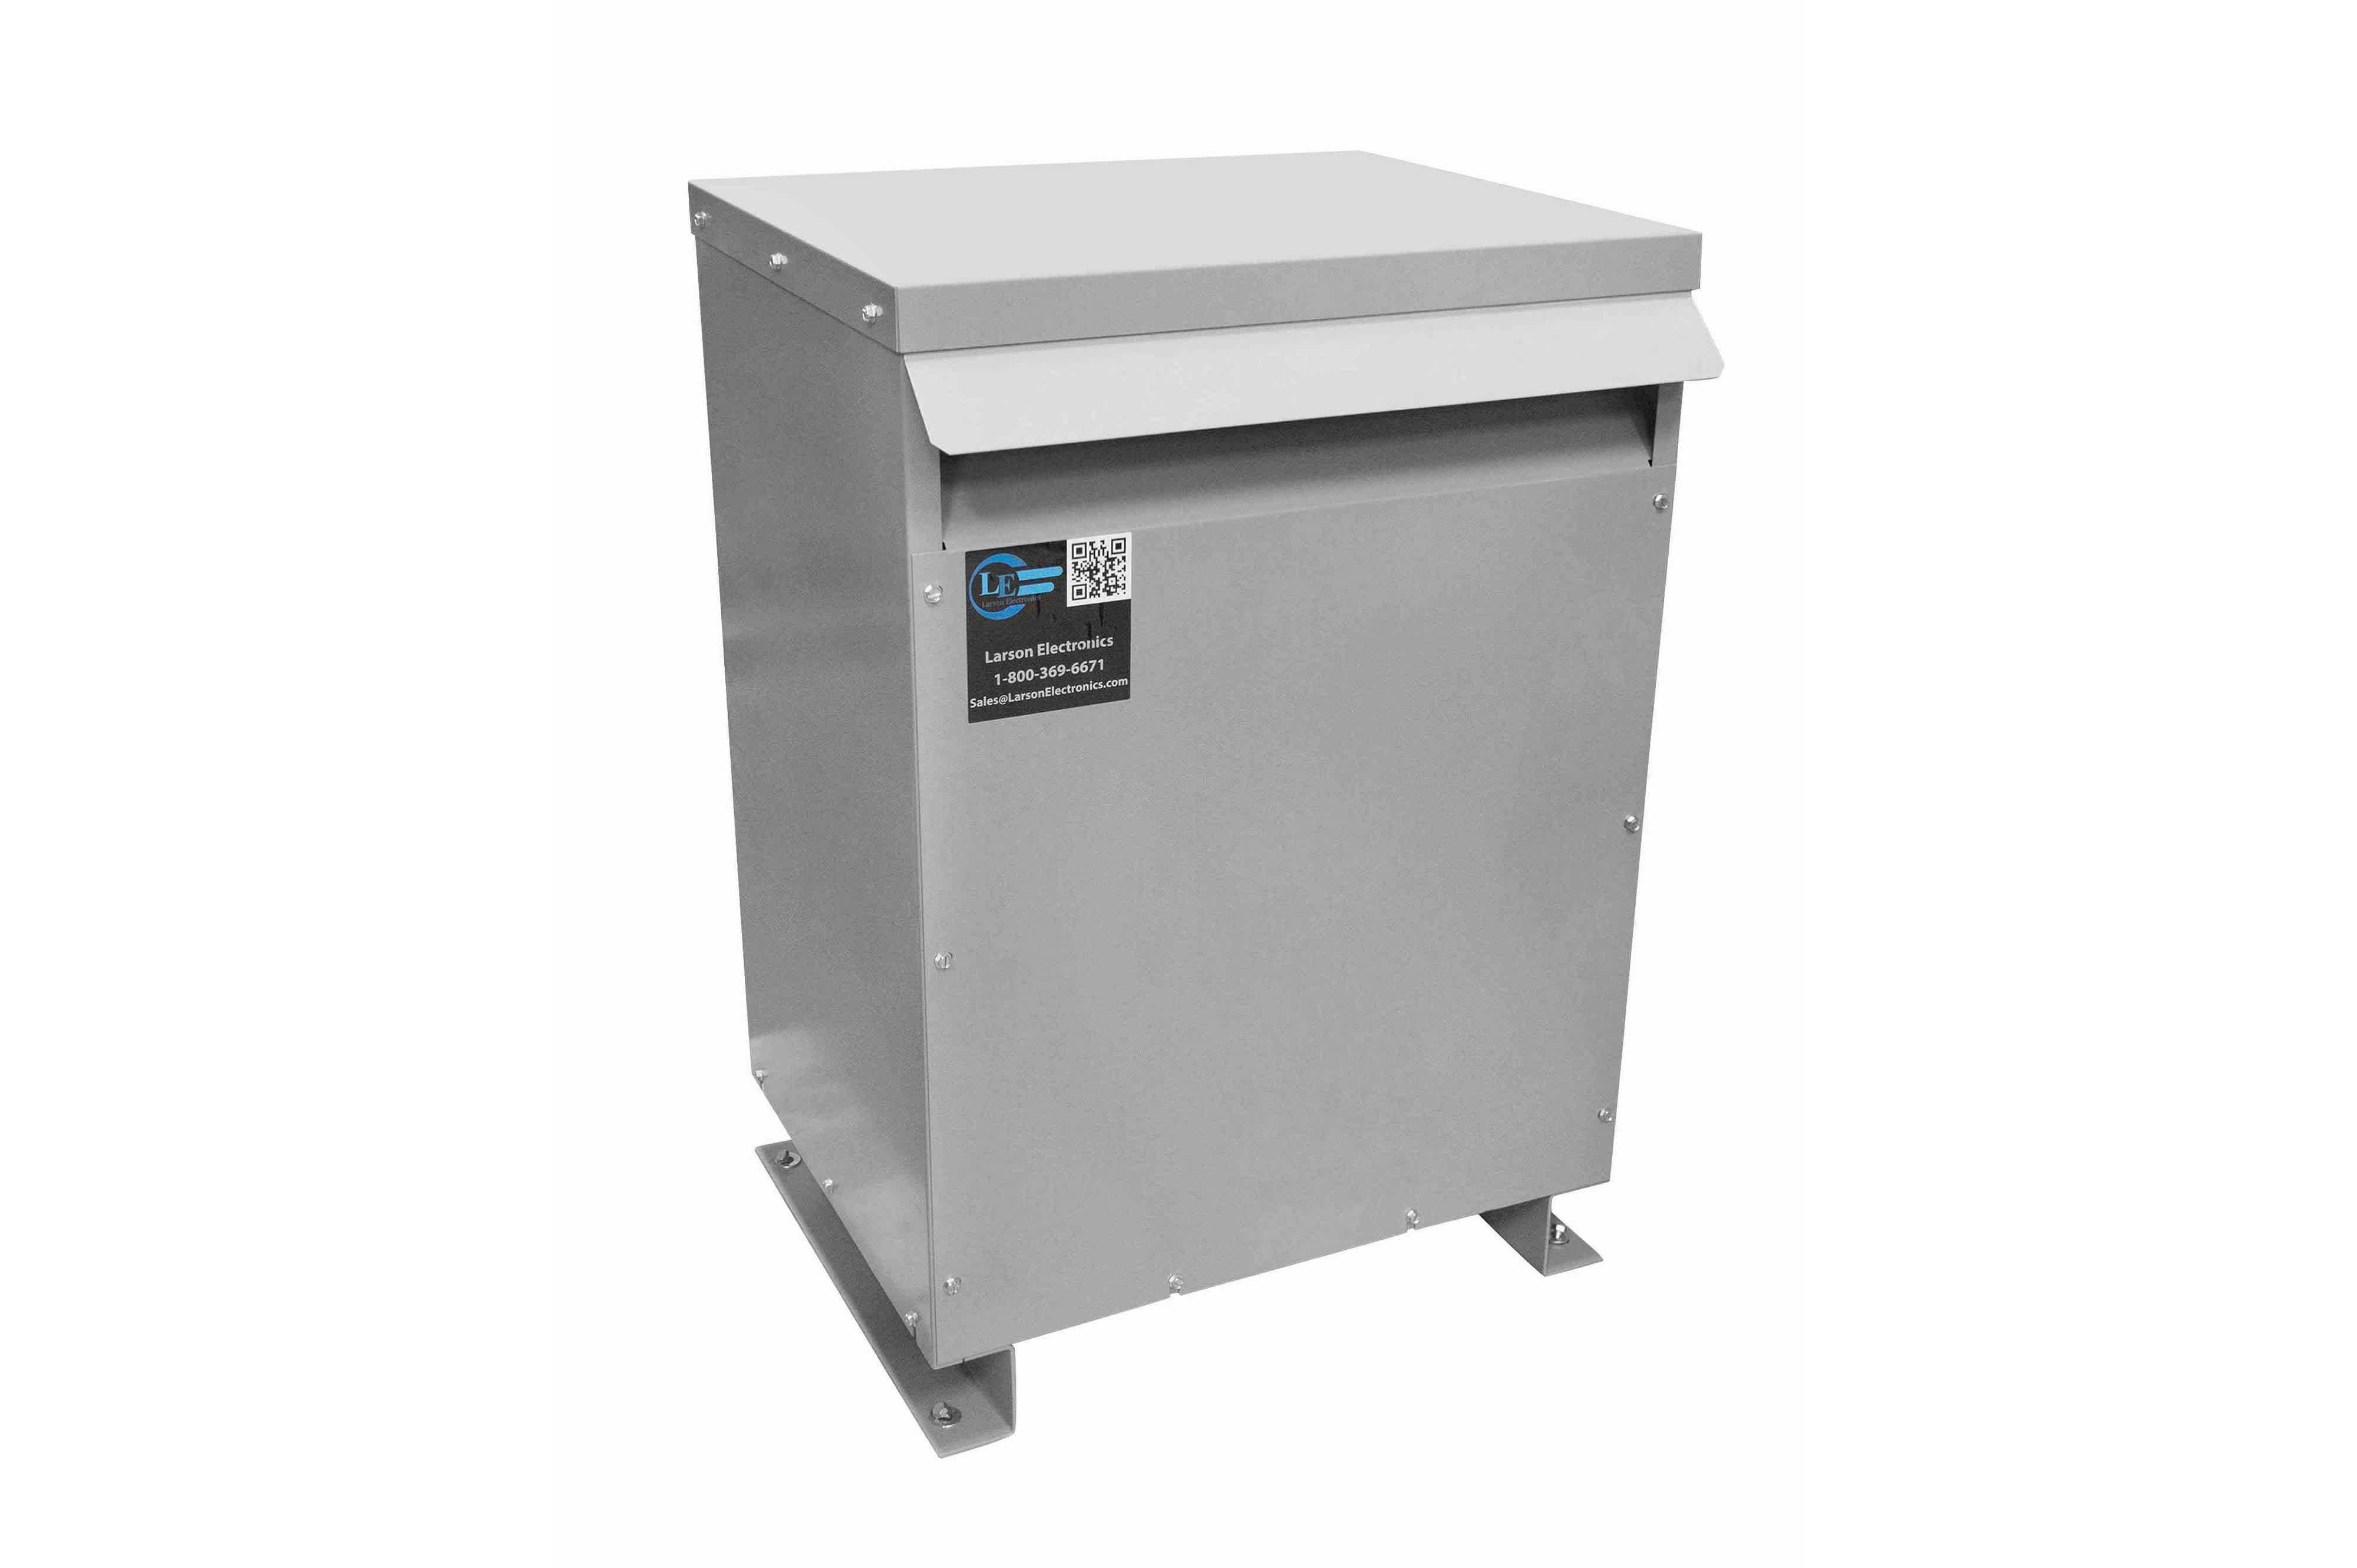 28 kVA 3PH Isolation Transformer, 460V Wye Primary, 400Y/231 Wye-N Secondary, N3R, Ventilated, 60 Hz